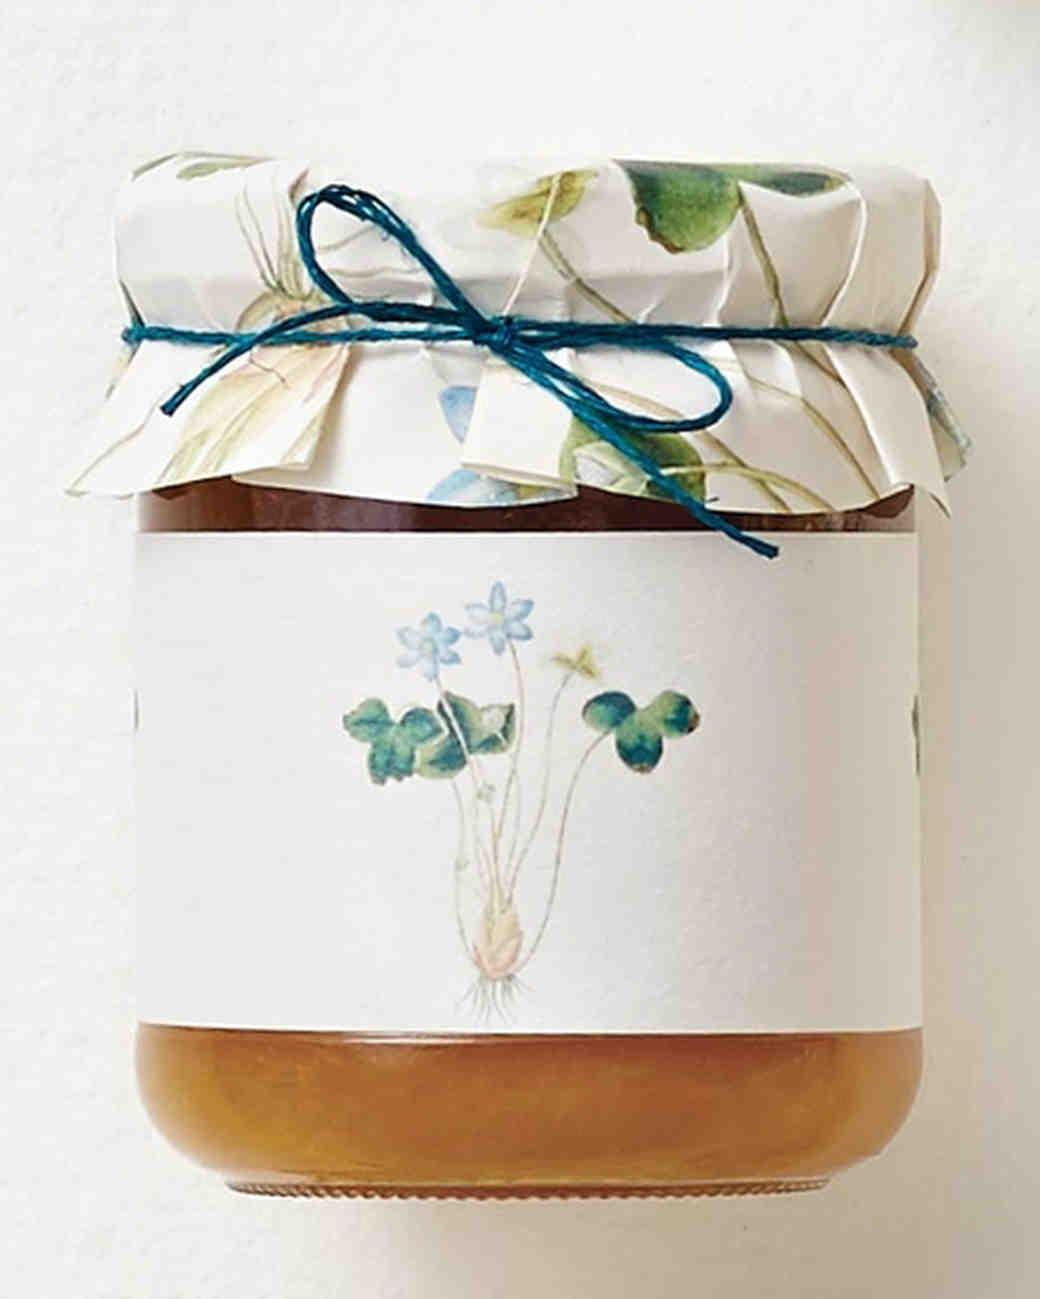 party-favors-patterned-paper-and-string-jar-jam-187-d112911.jpg